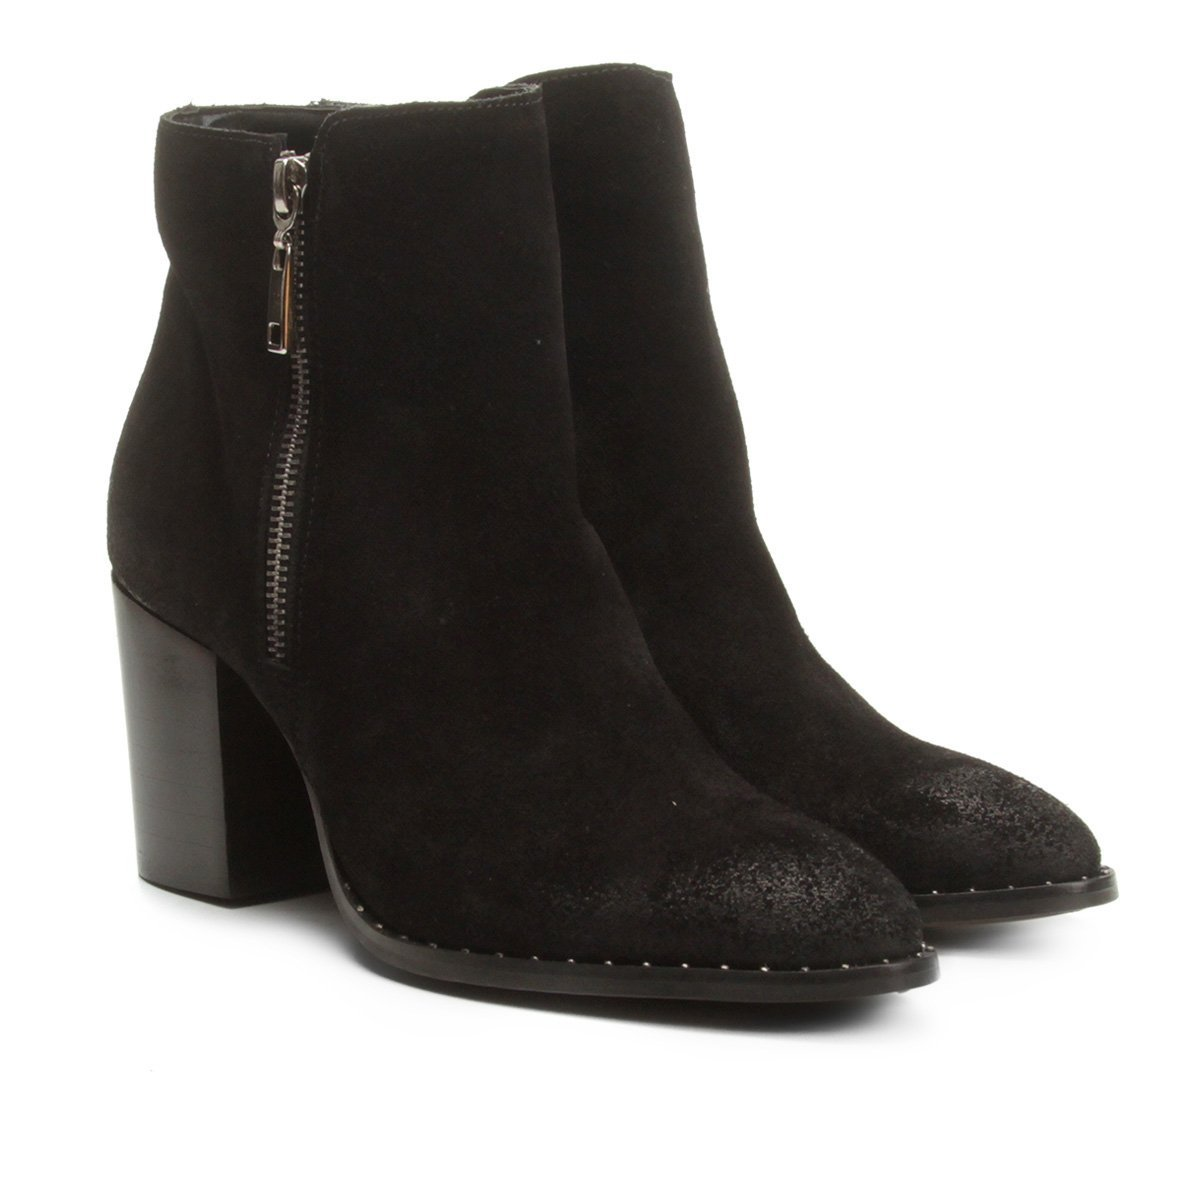 ac7dea66e Bota Couro Cano Curto Shoestock Salto Bloco Feminina - Preto - Compre Agora